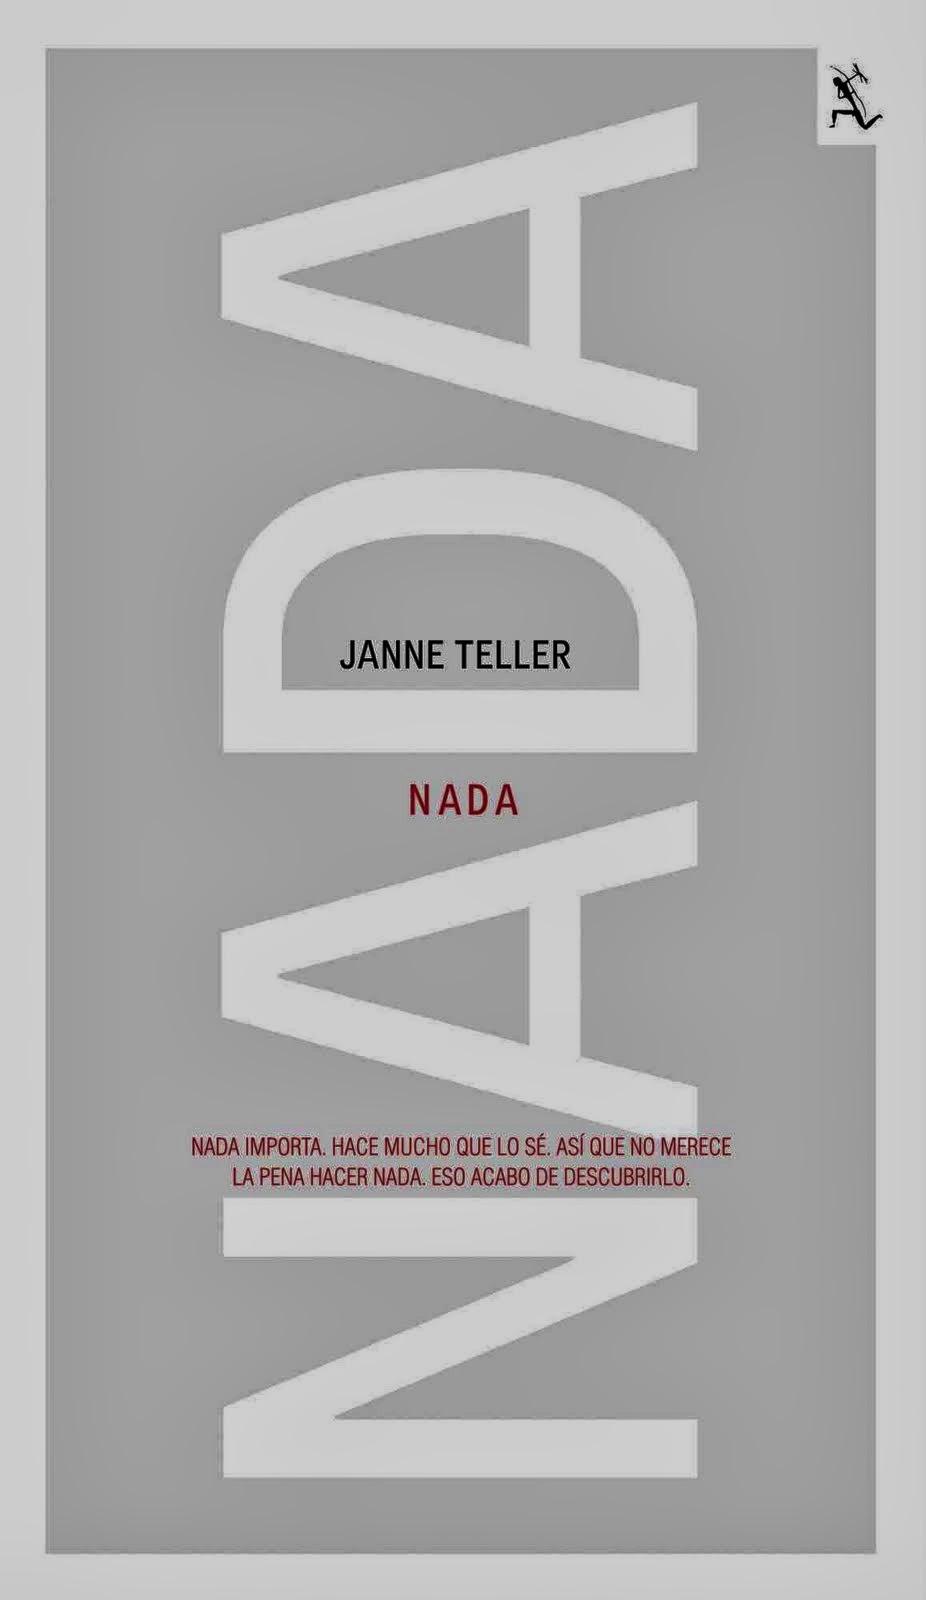 Janne Teller Libros